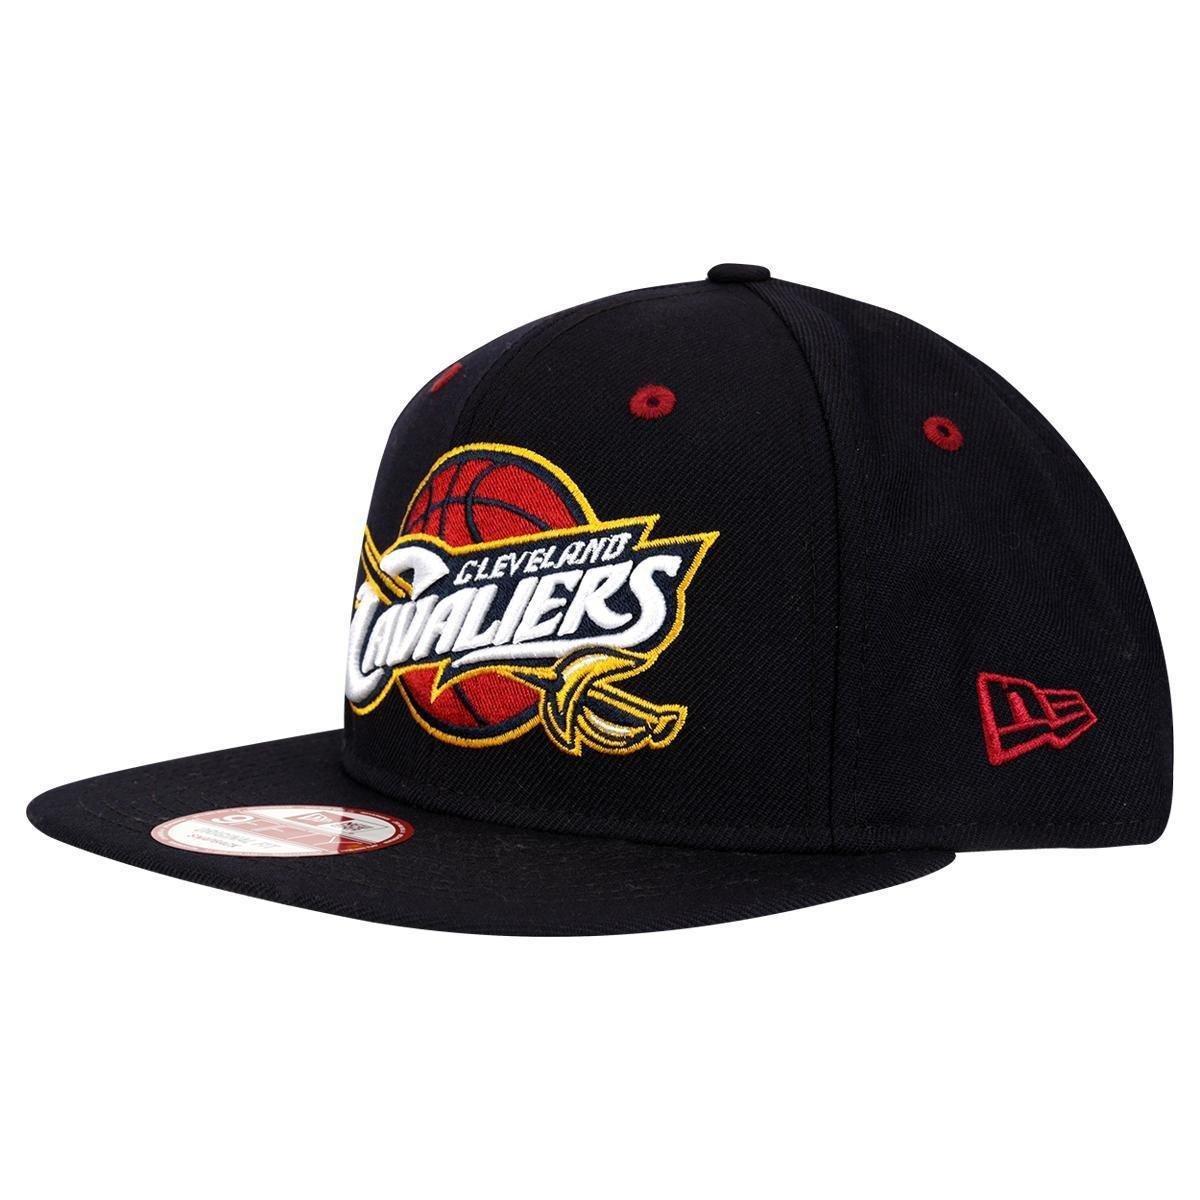 fbfe7af1eea40 Boné New Era 950 Of Sn NBA Cleveland Cavaliers - Compre Agora